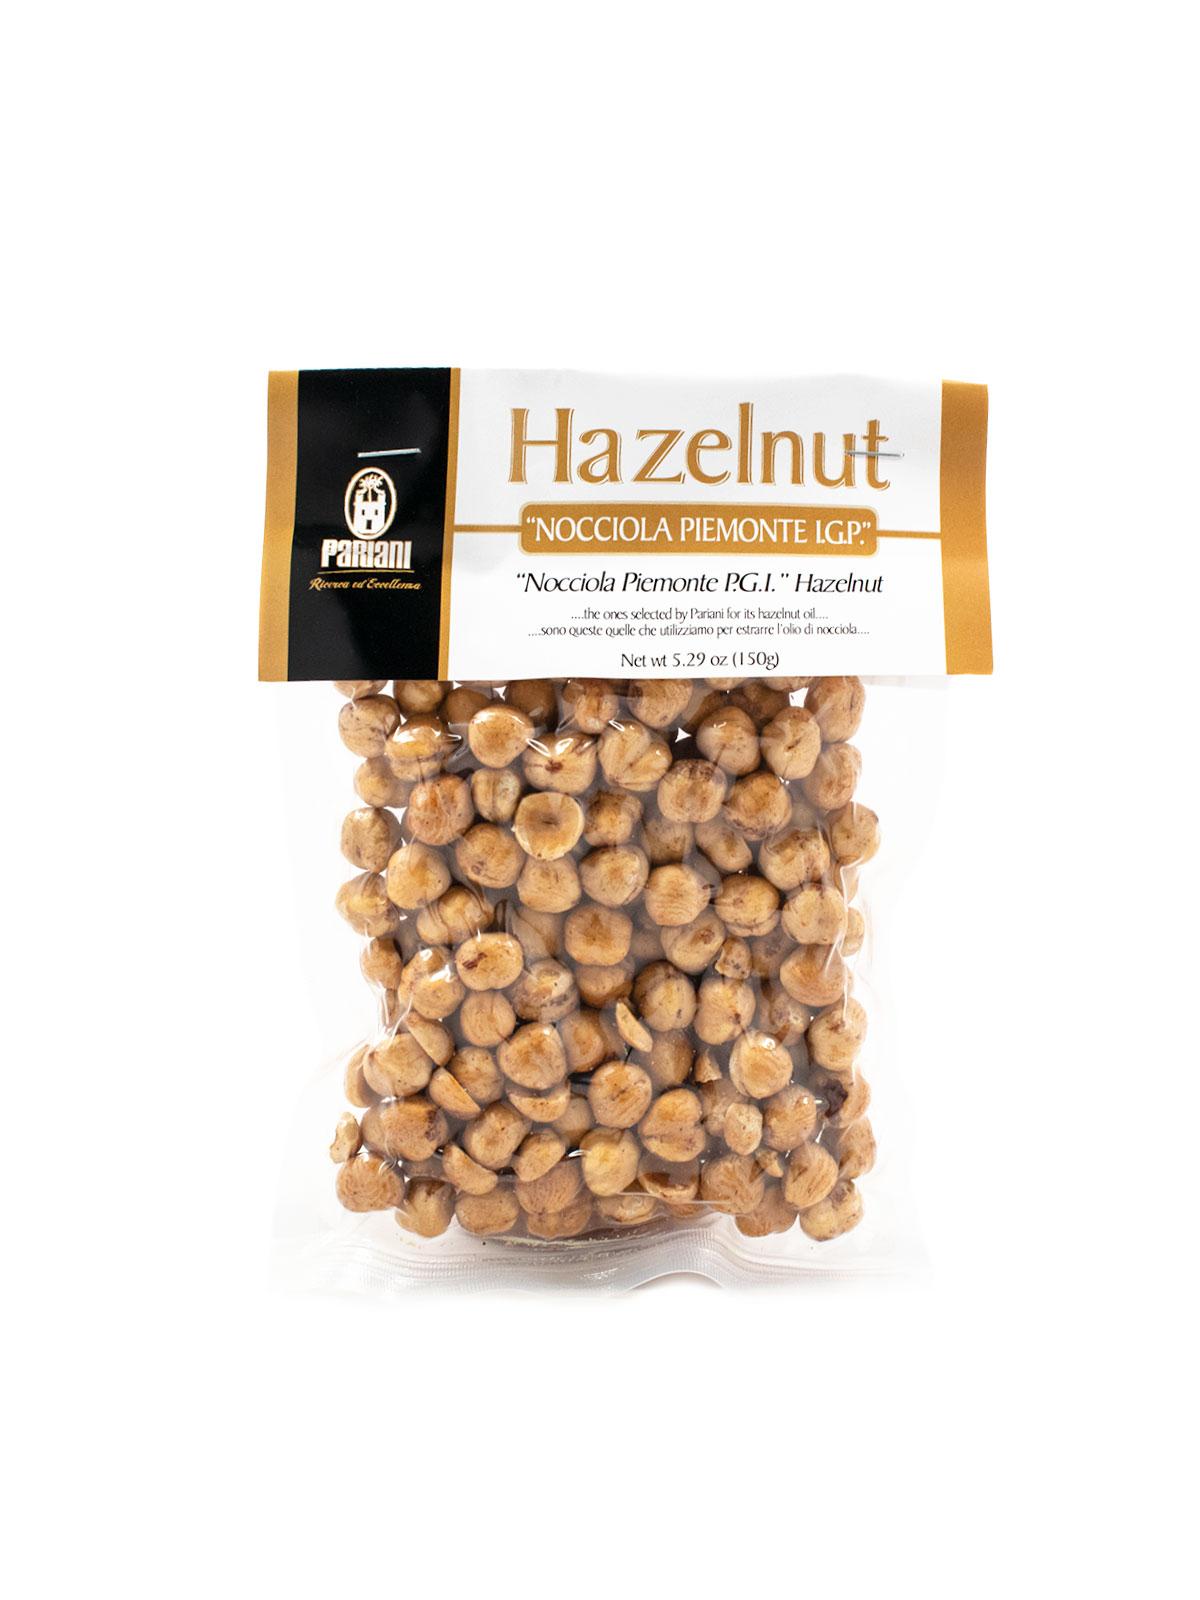 RoastedNocciola Piemonte P.G.I. Hazelnuts - Sweets, Treats & Snacks - Buon'Italia